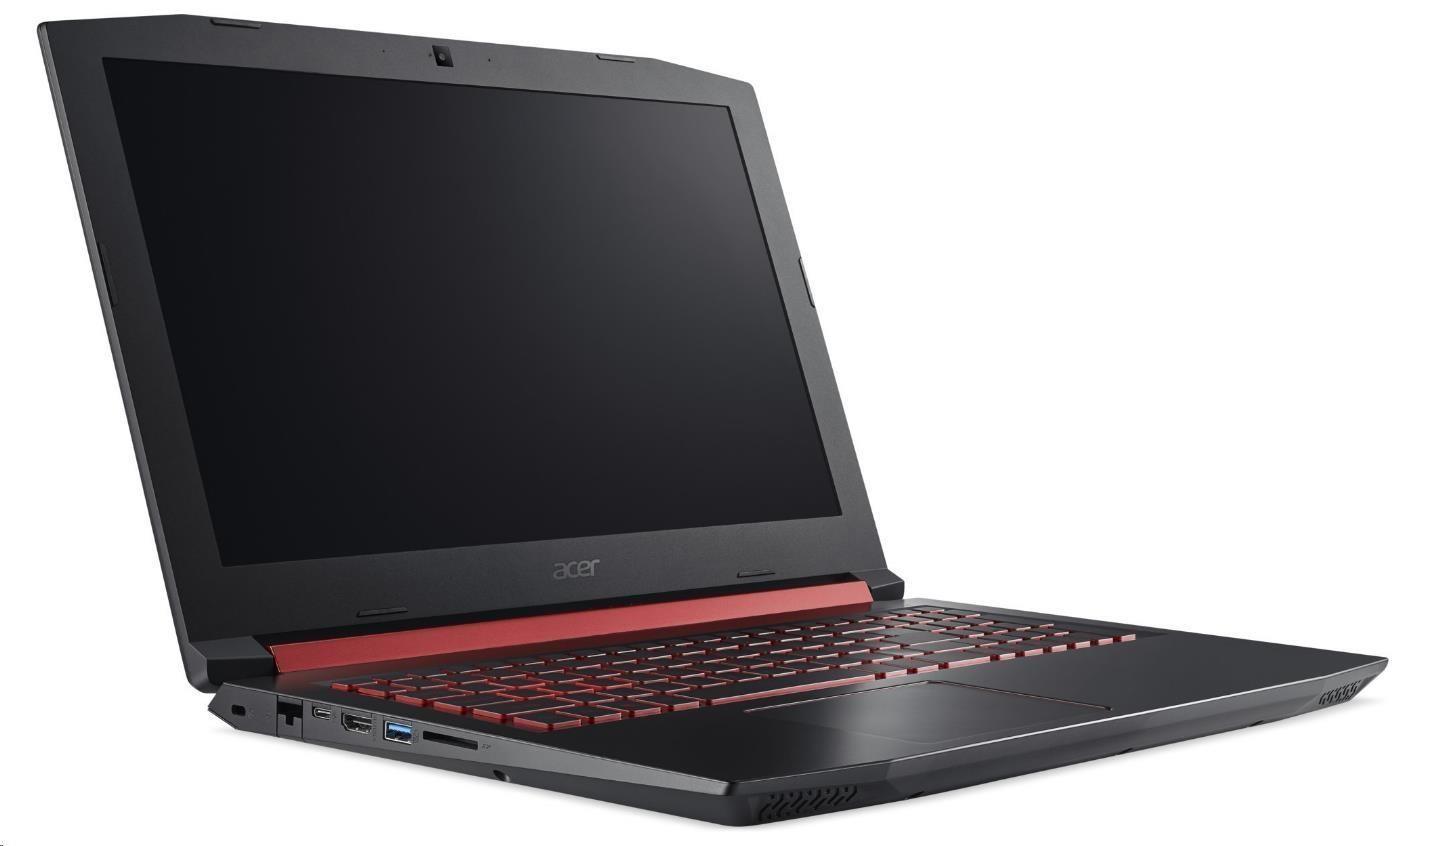 "ACER NTB Nitro 5 (AN515-52-79VA), i7-8750UH,15.6""FHD IPS,16GB,256SSD+1TBHDD/7200,GTX 1060-6G,noDVD,čt.pk,USB-C,4c,W10H"